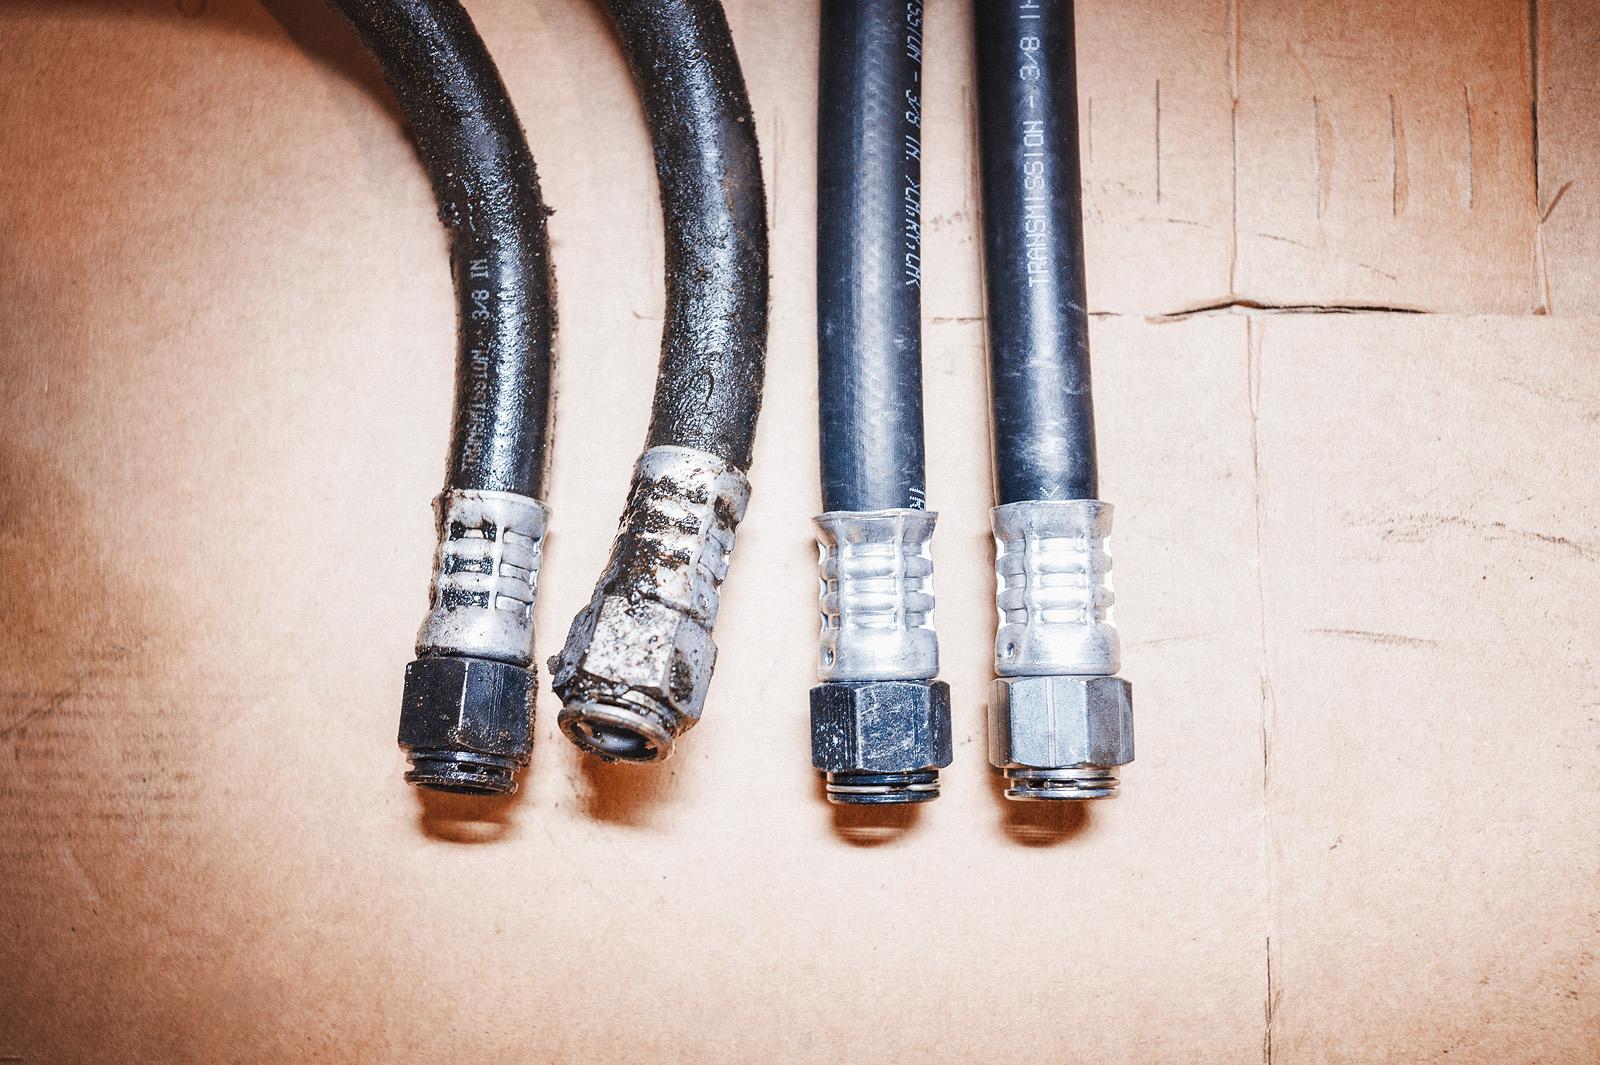 Текущие трубки вариатора подлежат замене